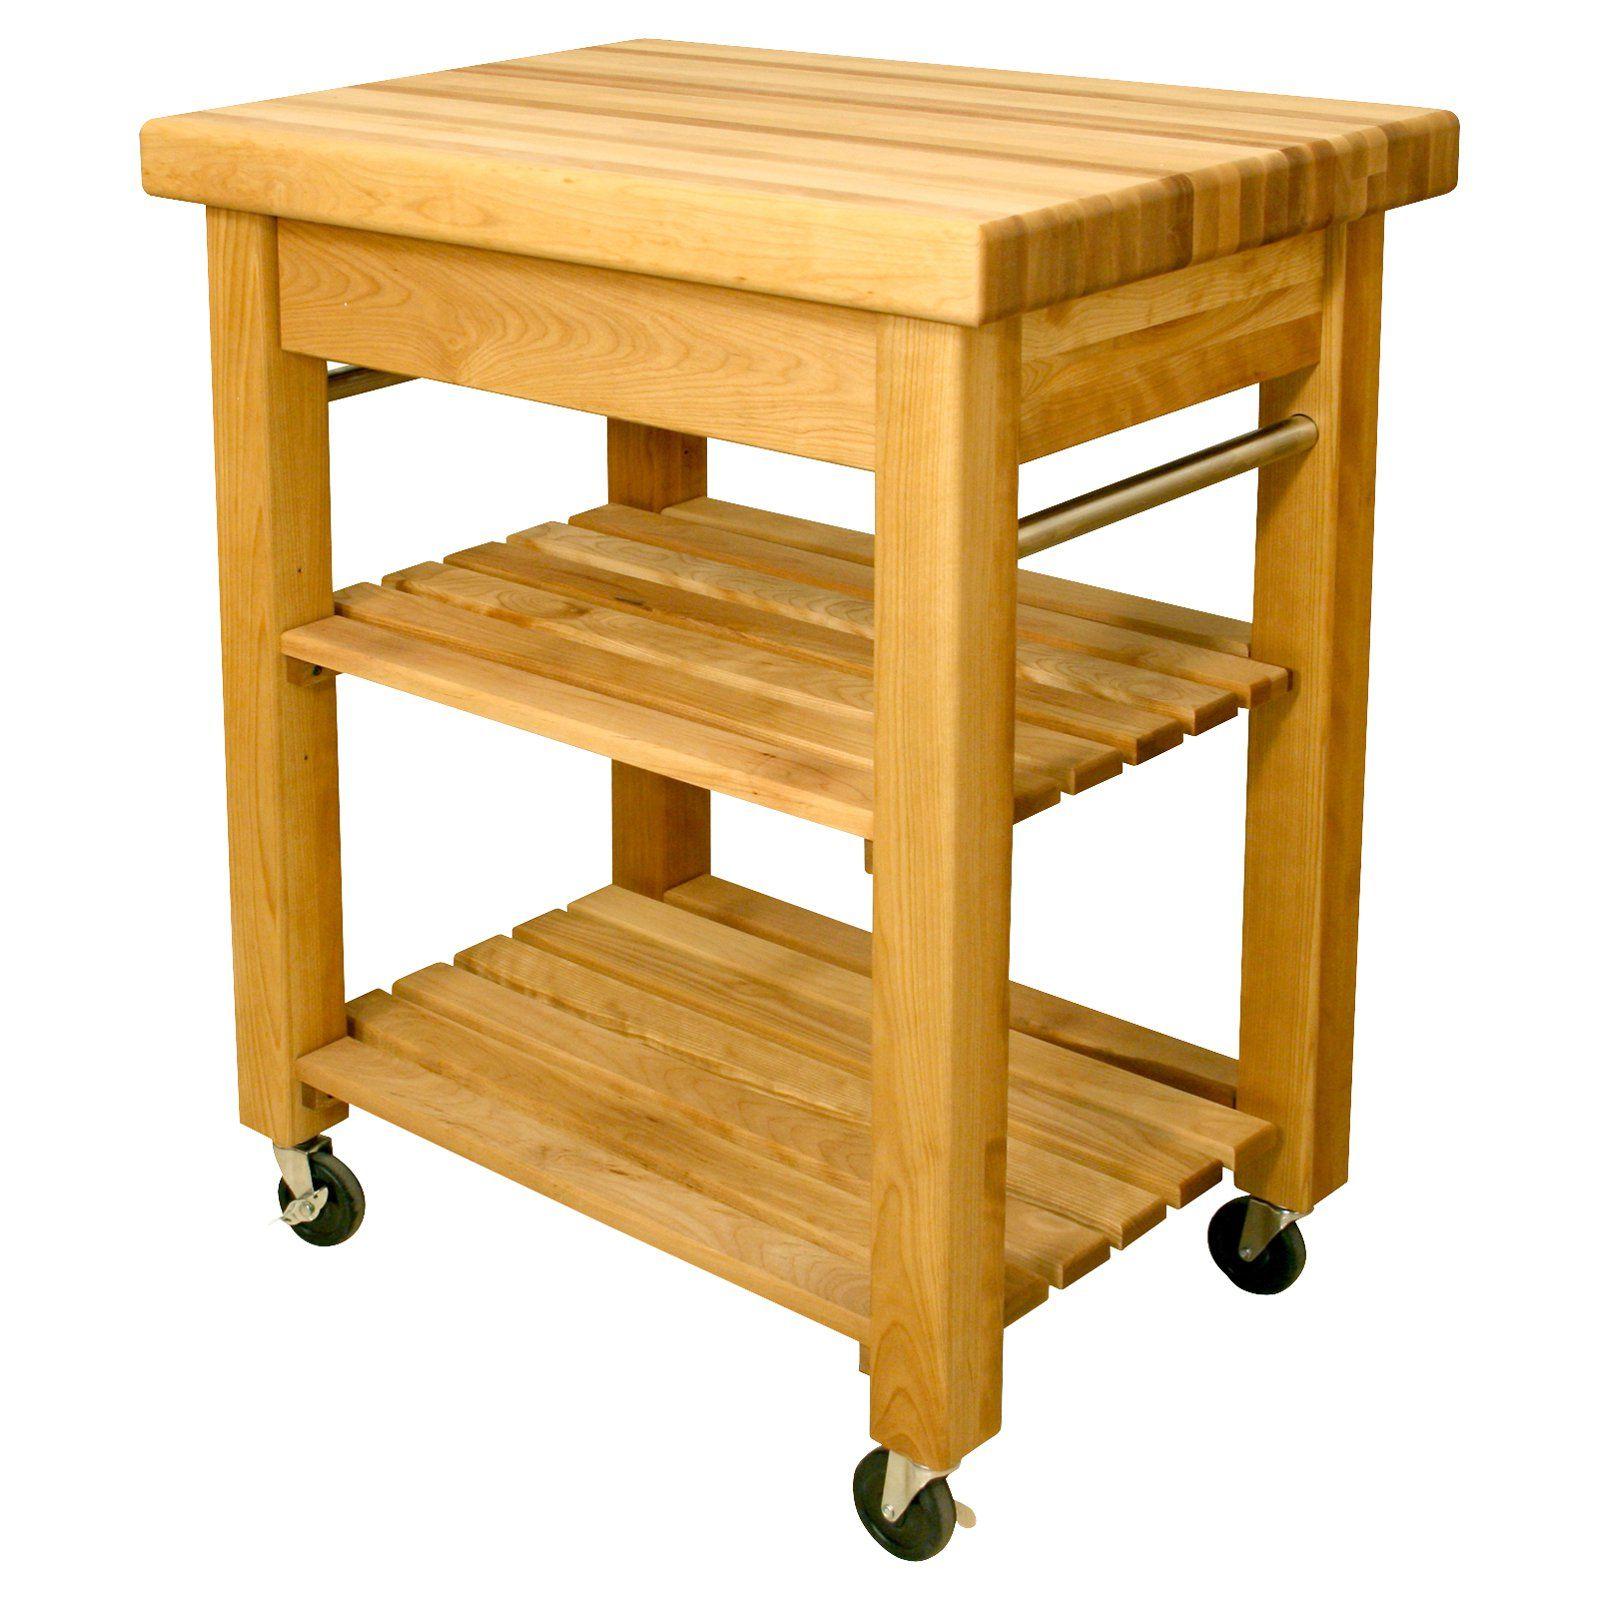 Beacon Kitchen Cart | from hayneedle.com | Kitchen Carts | Pinterest ...